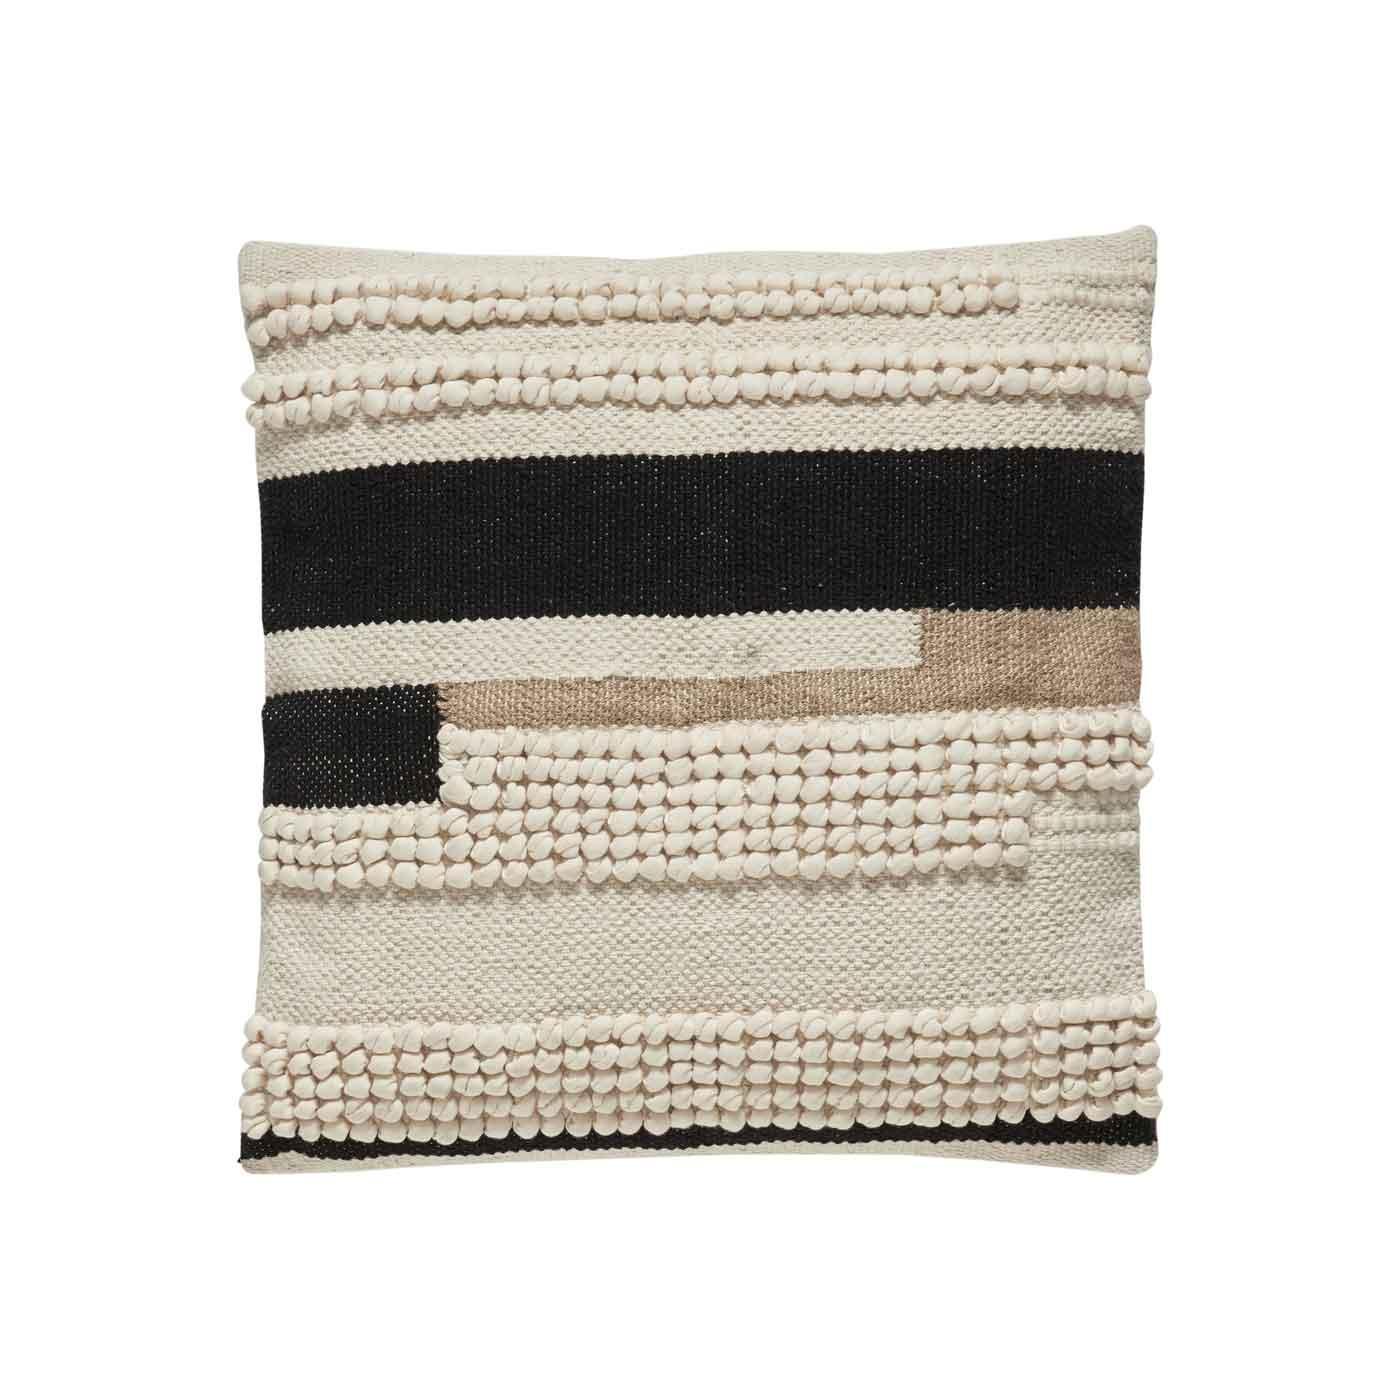 HÜBSCH pude m. mønster - hvid/sort/brun bomuld (45x45) thumbnail